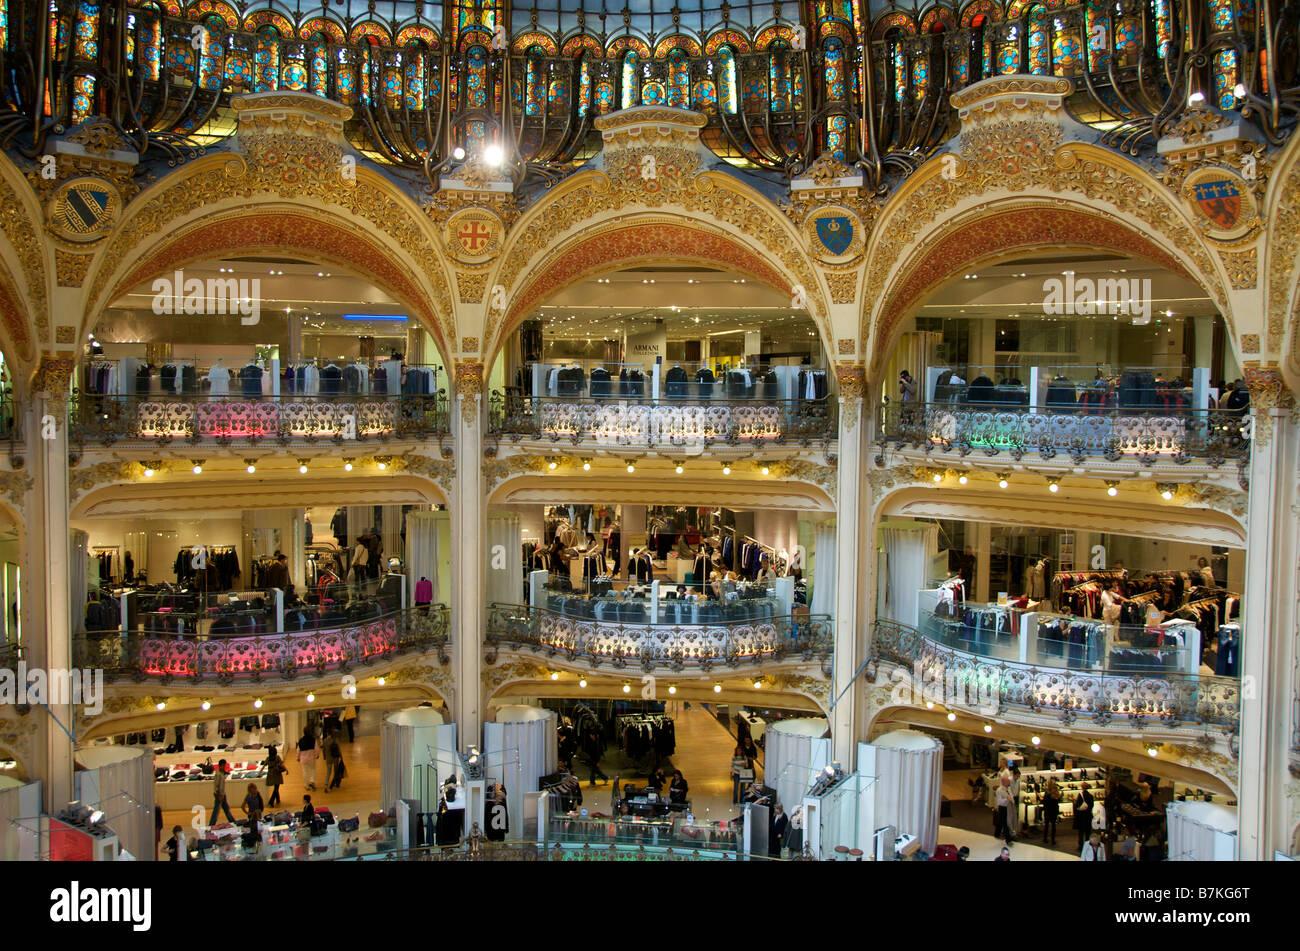 Galeries Lafayette department store Paris France - Stock Image